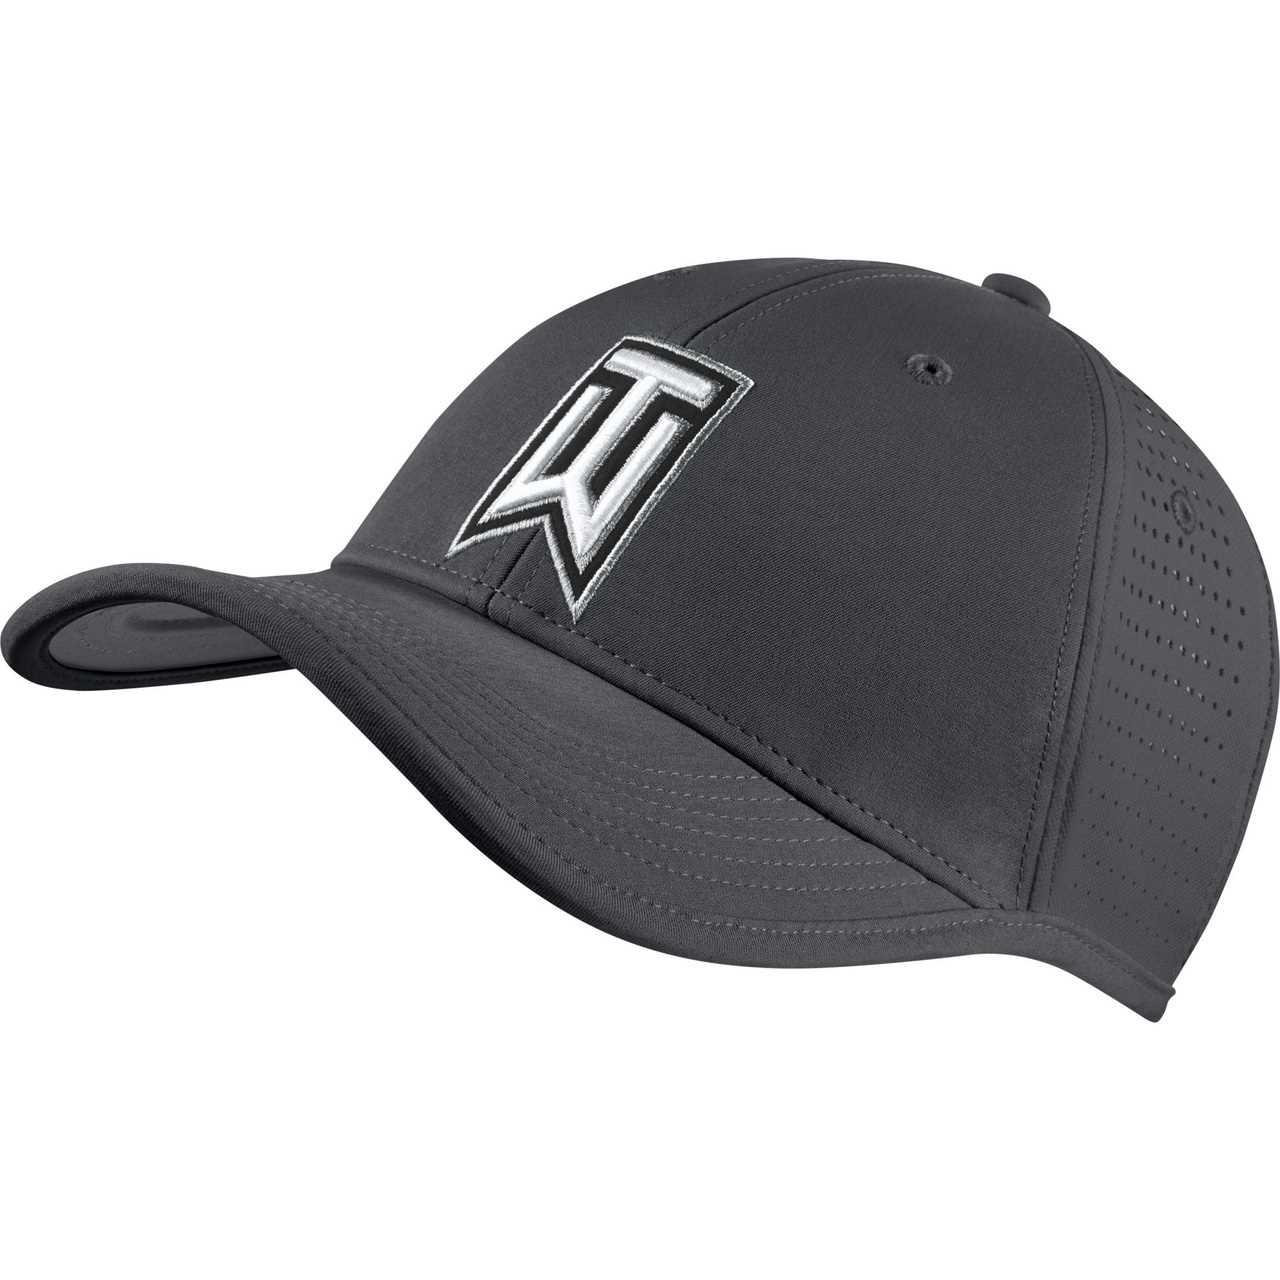 32b8e37a944 Nike Golf TW Ultralight Tour Adjustable Hat (Black White) - Dark ...